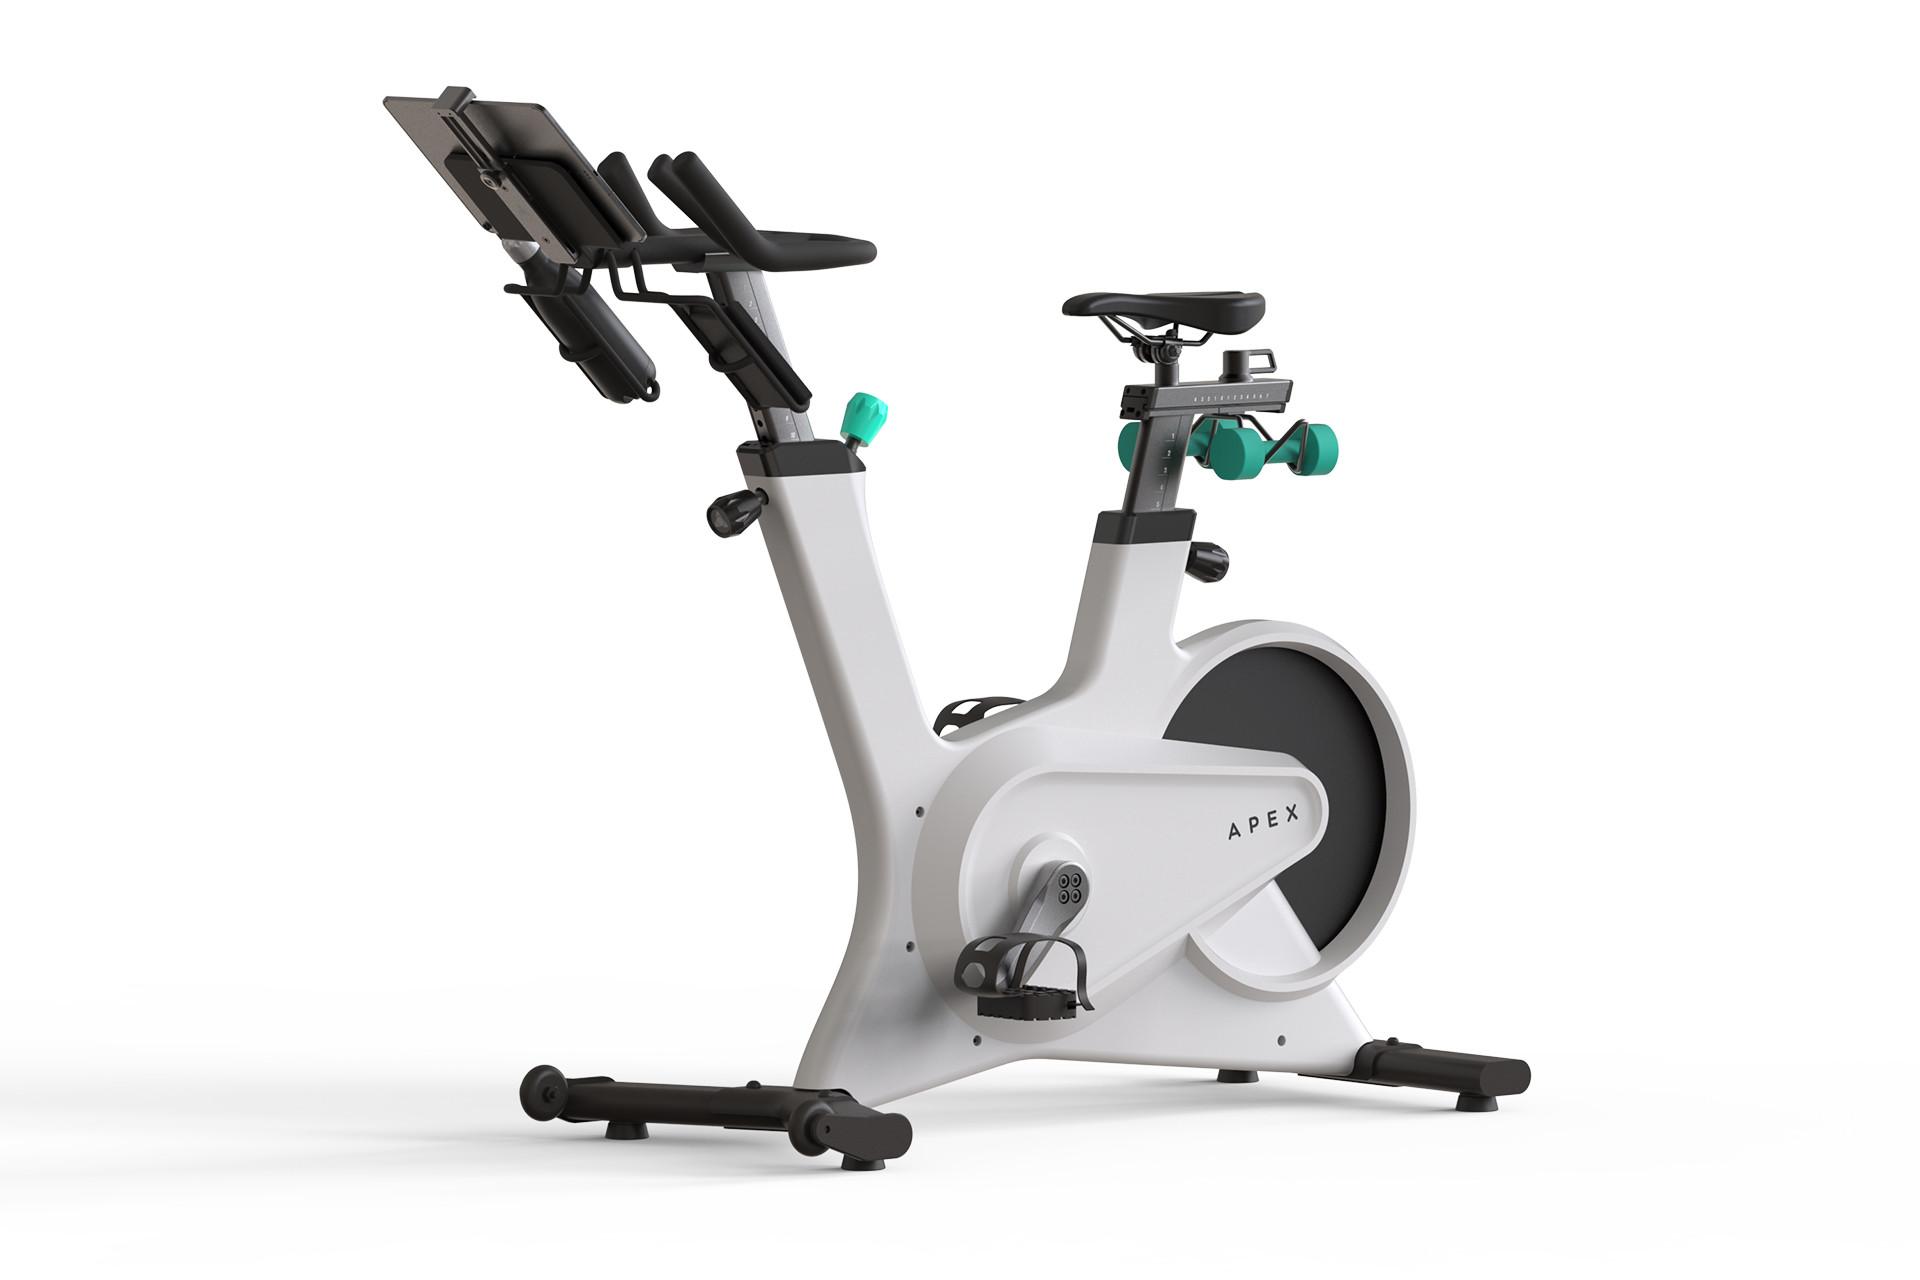 Apex exercise bike in white.